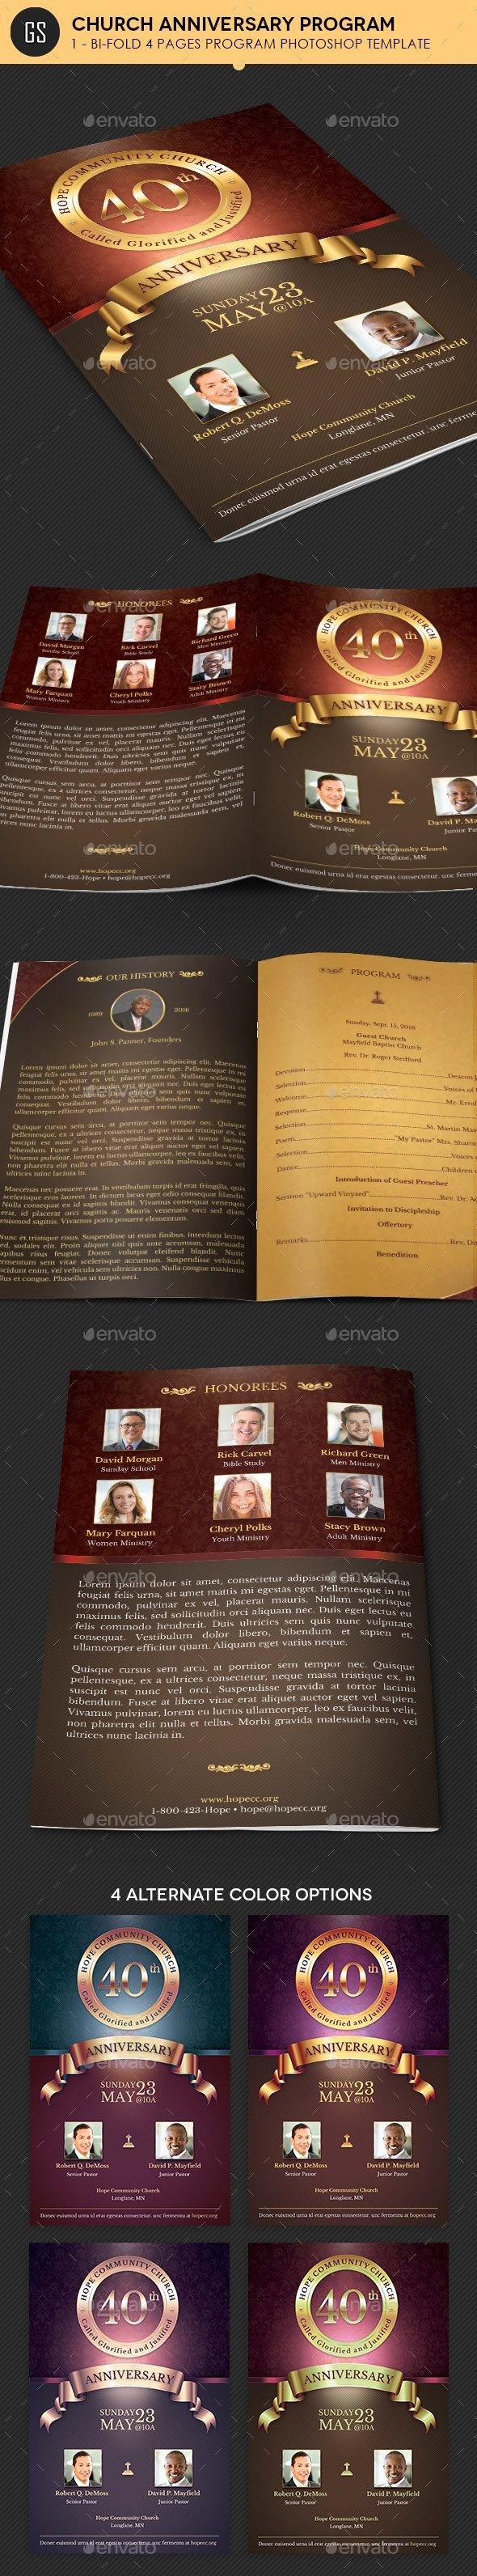 Church Anniversary Program Templates Free Best Of Best 107 Church Anniversary Print Templates Images On